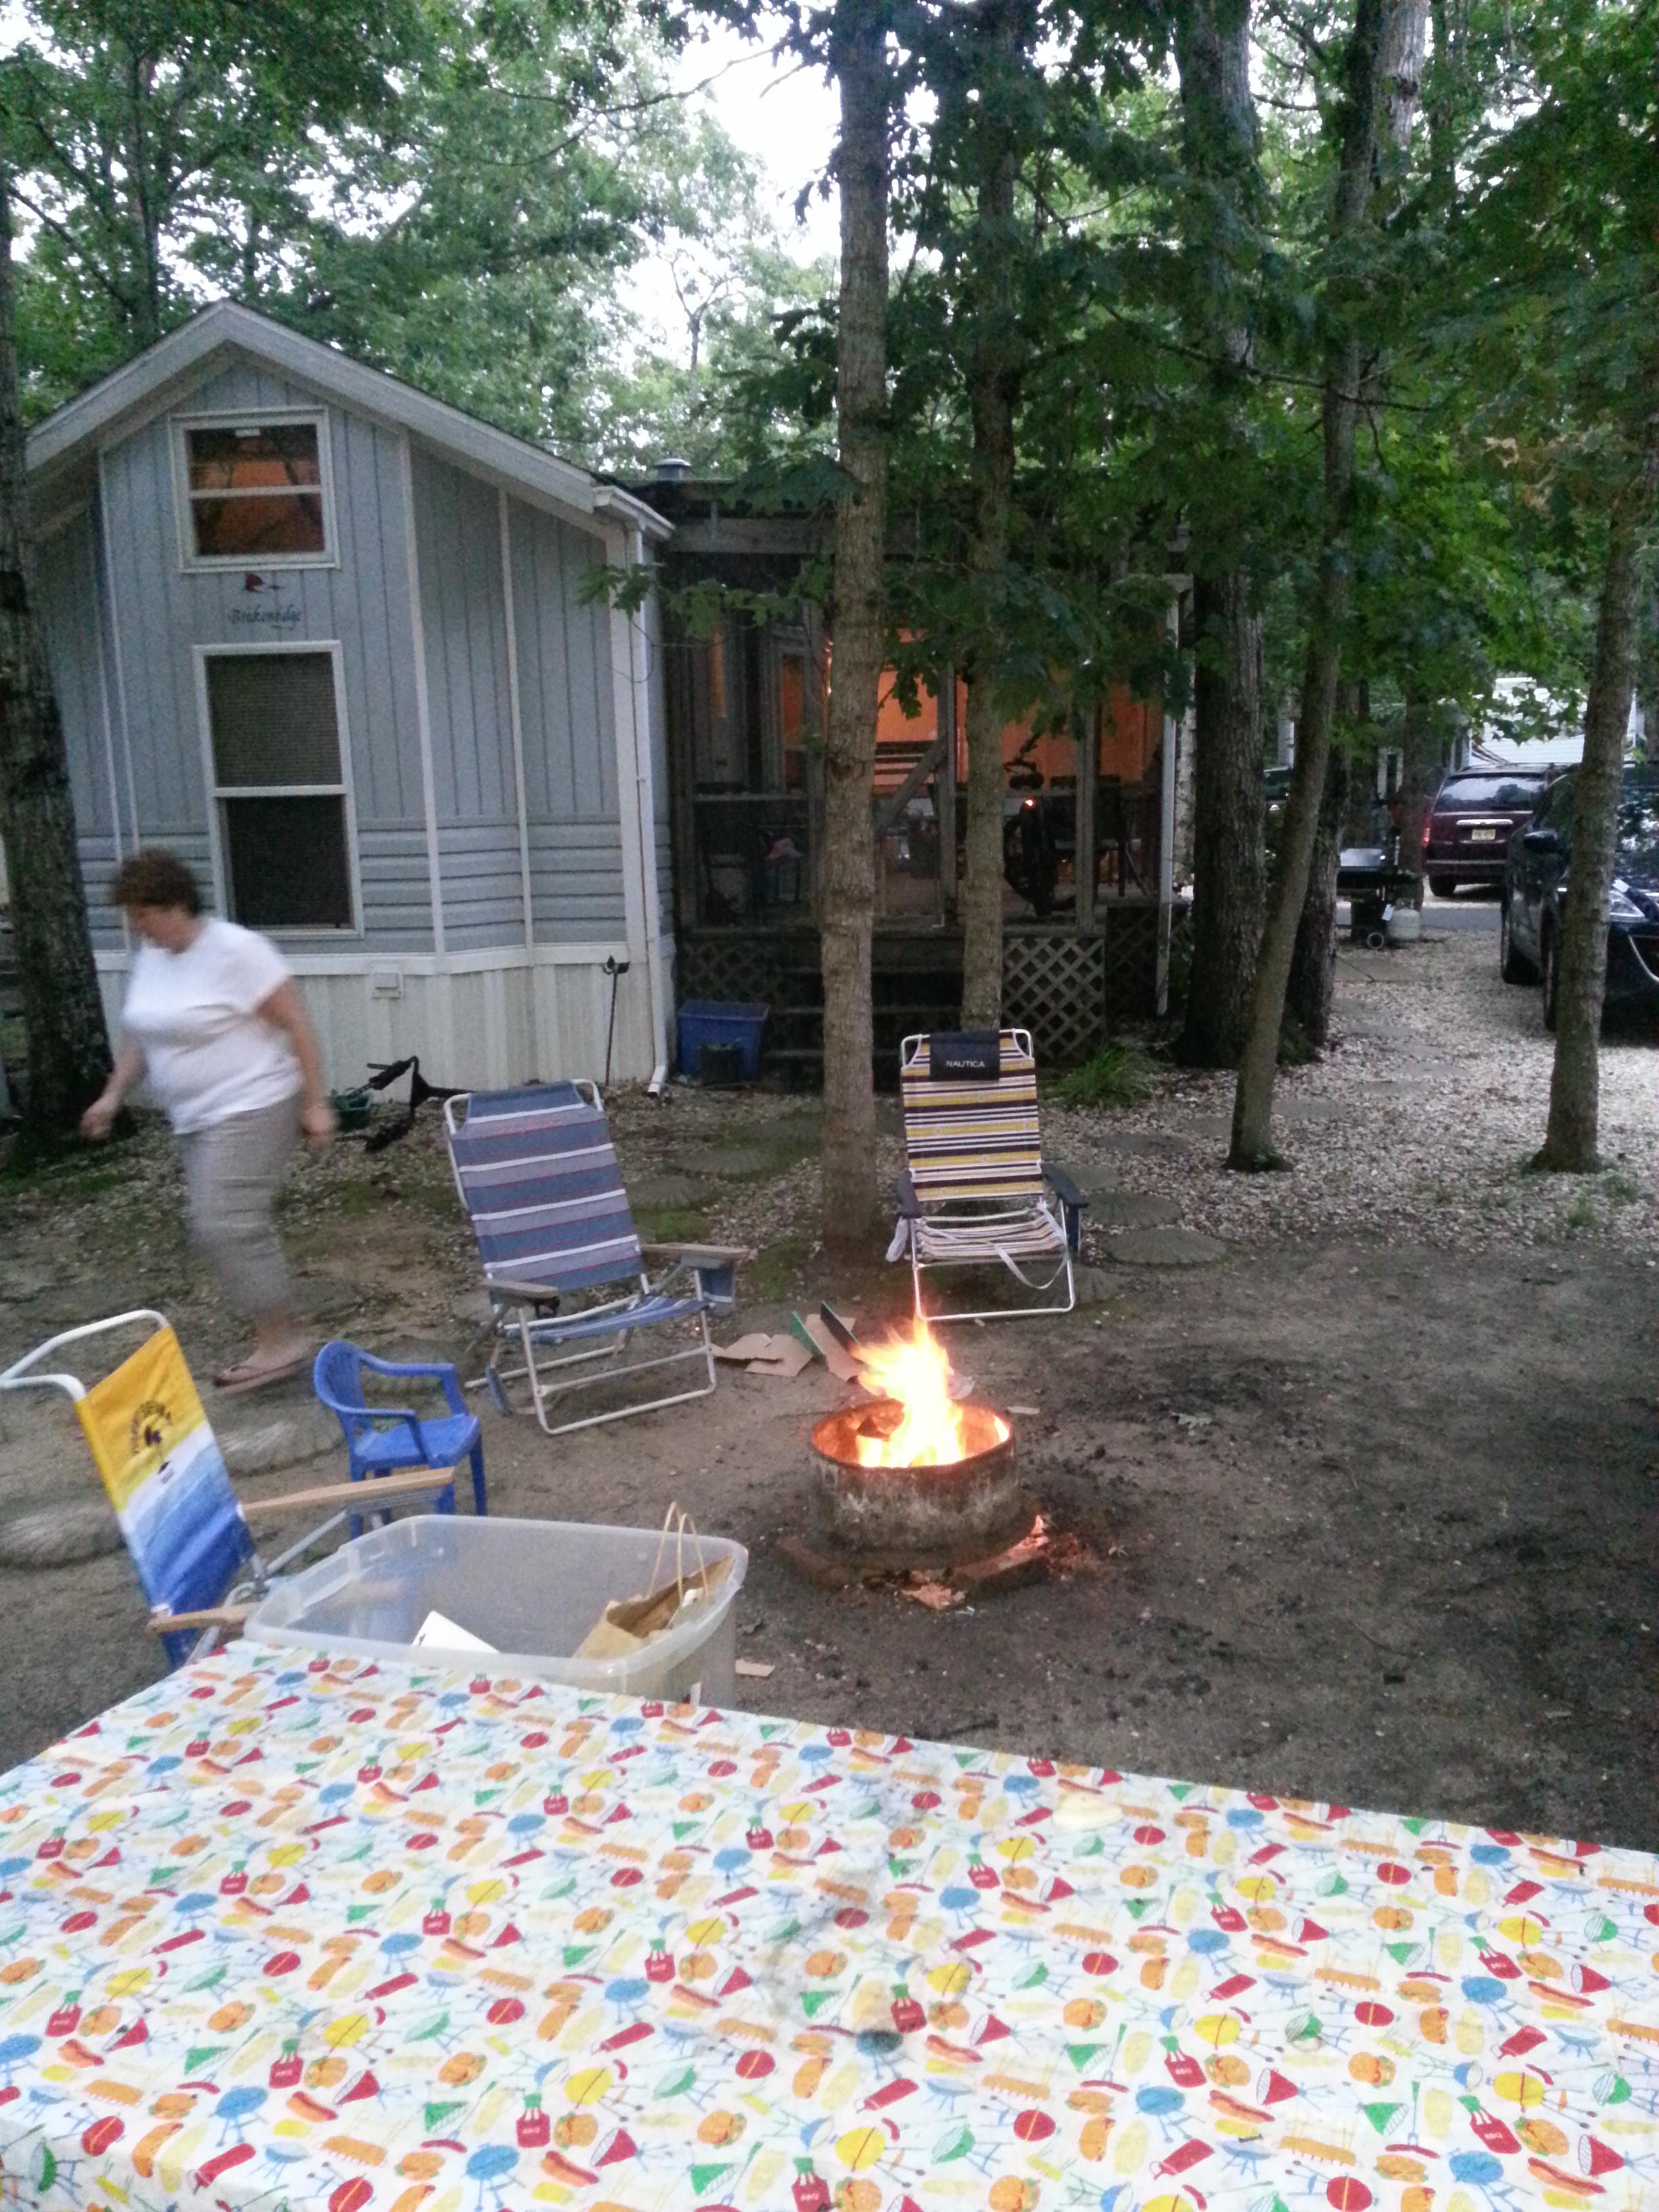 terri feralio - vacation cottage back yard before.jpg